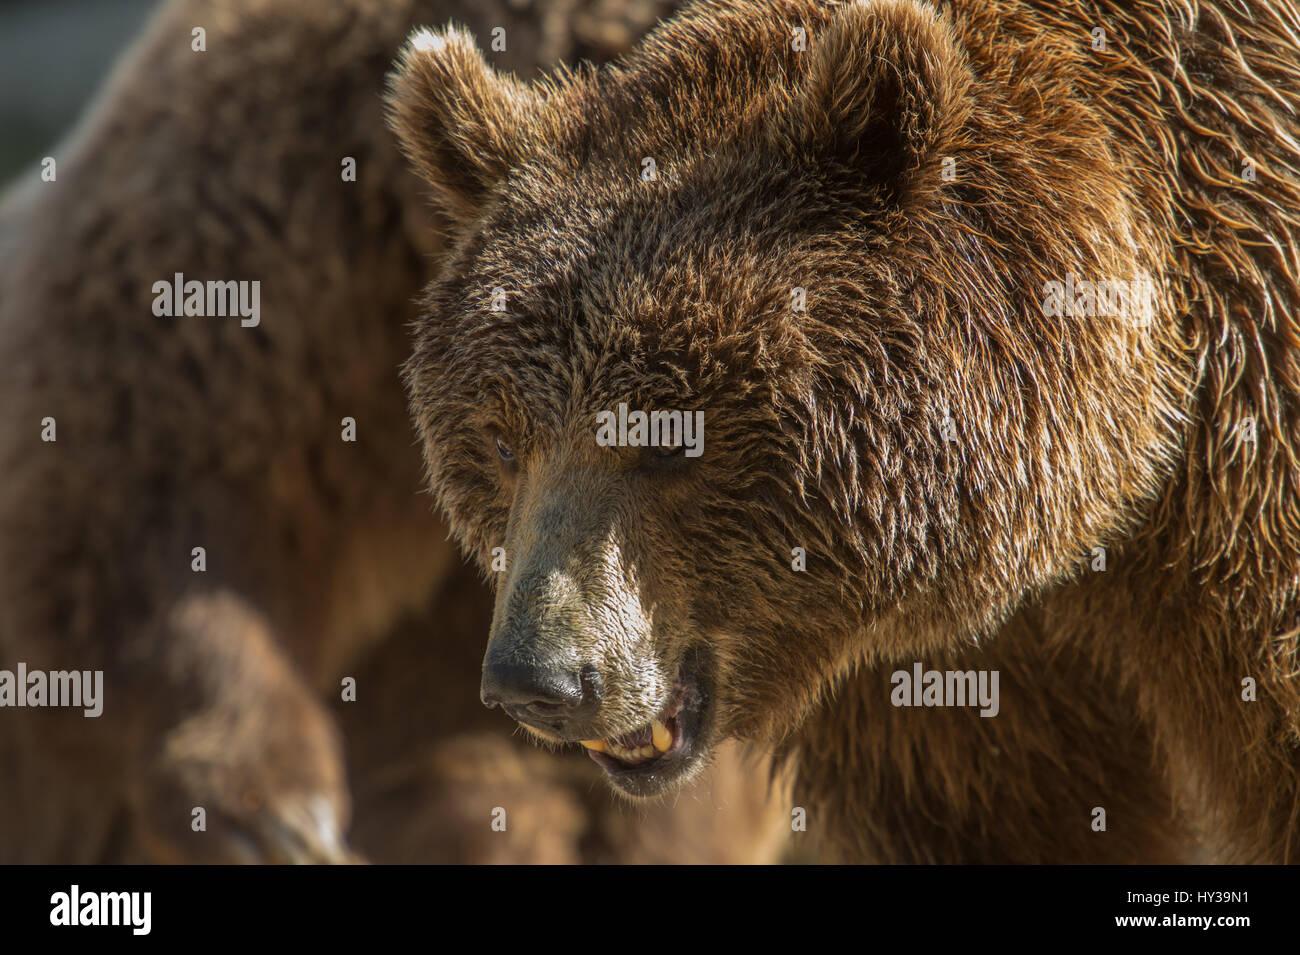 Brown Bear, Ursus arctos, Ursidae - Stock Image